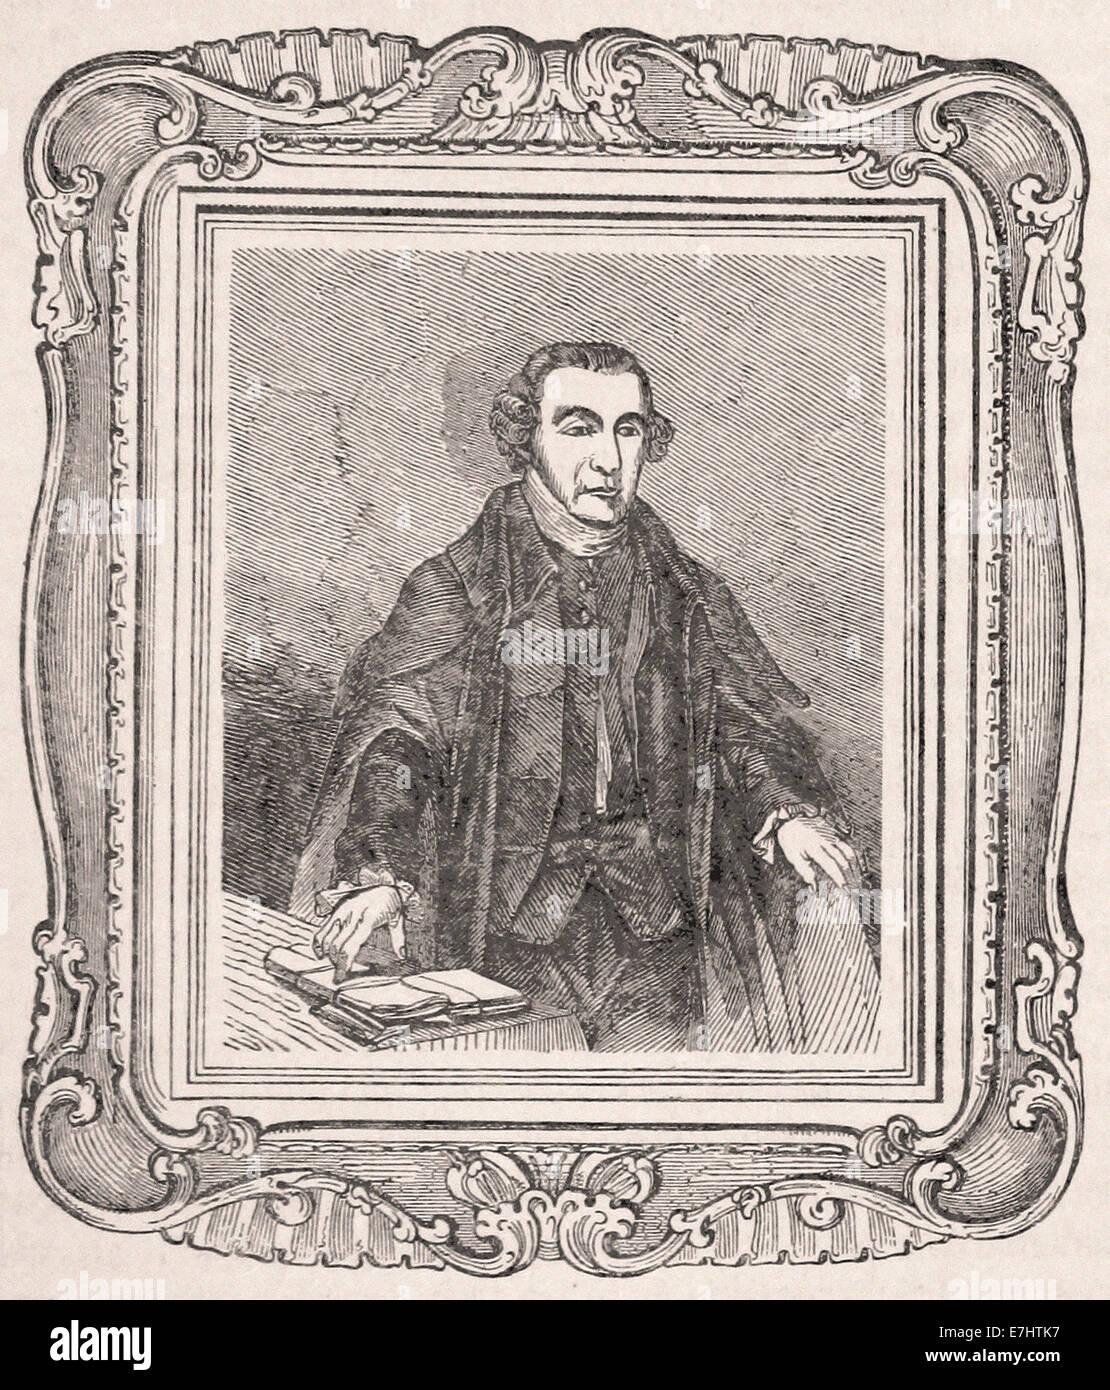 Porträt von Patrick Henry - Gravur - XIX. Jahrhundert Stockbild